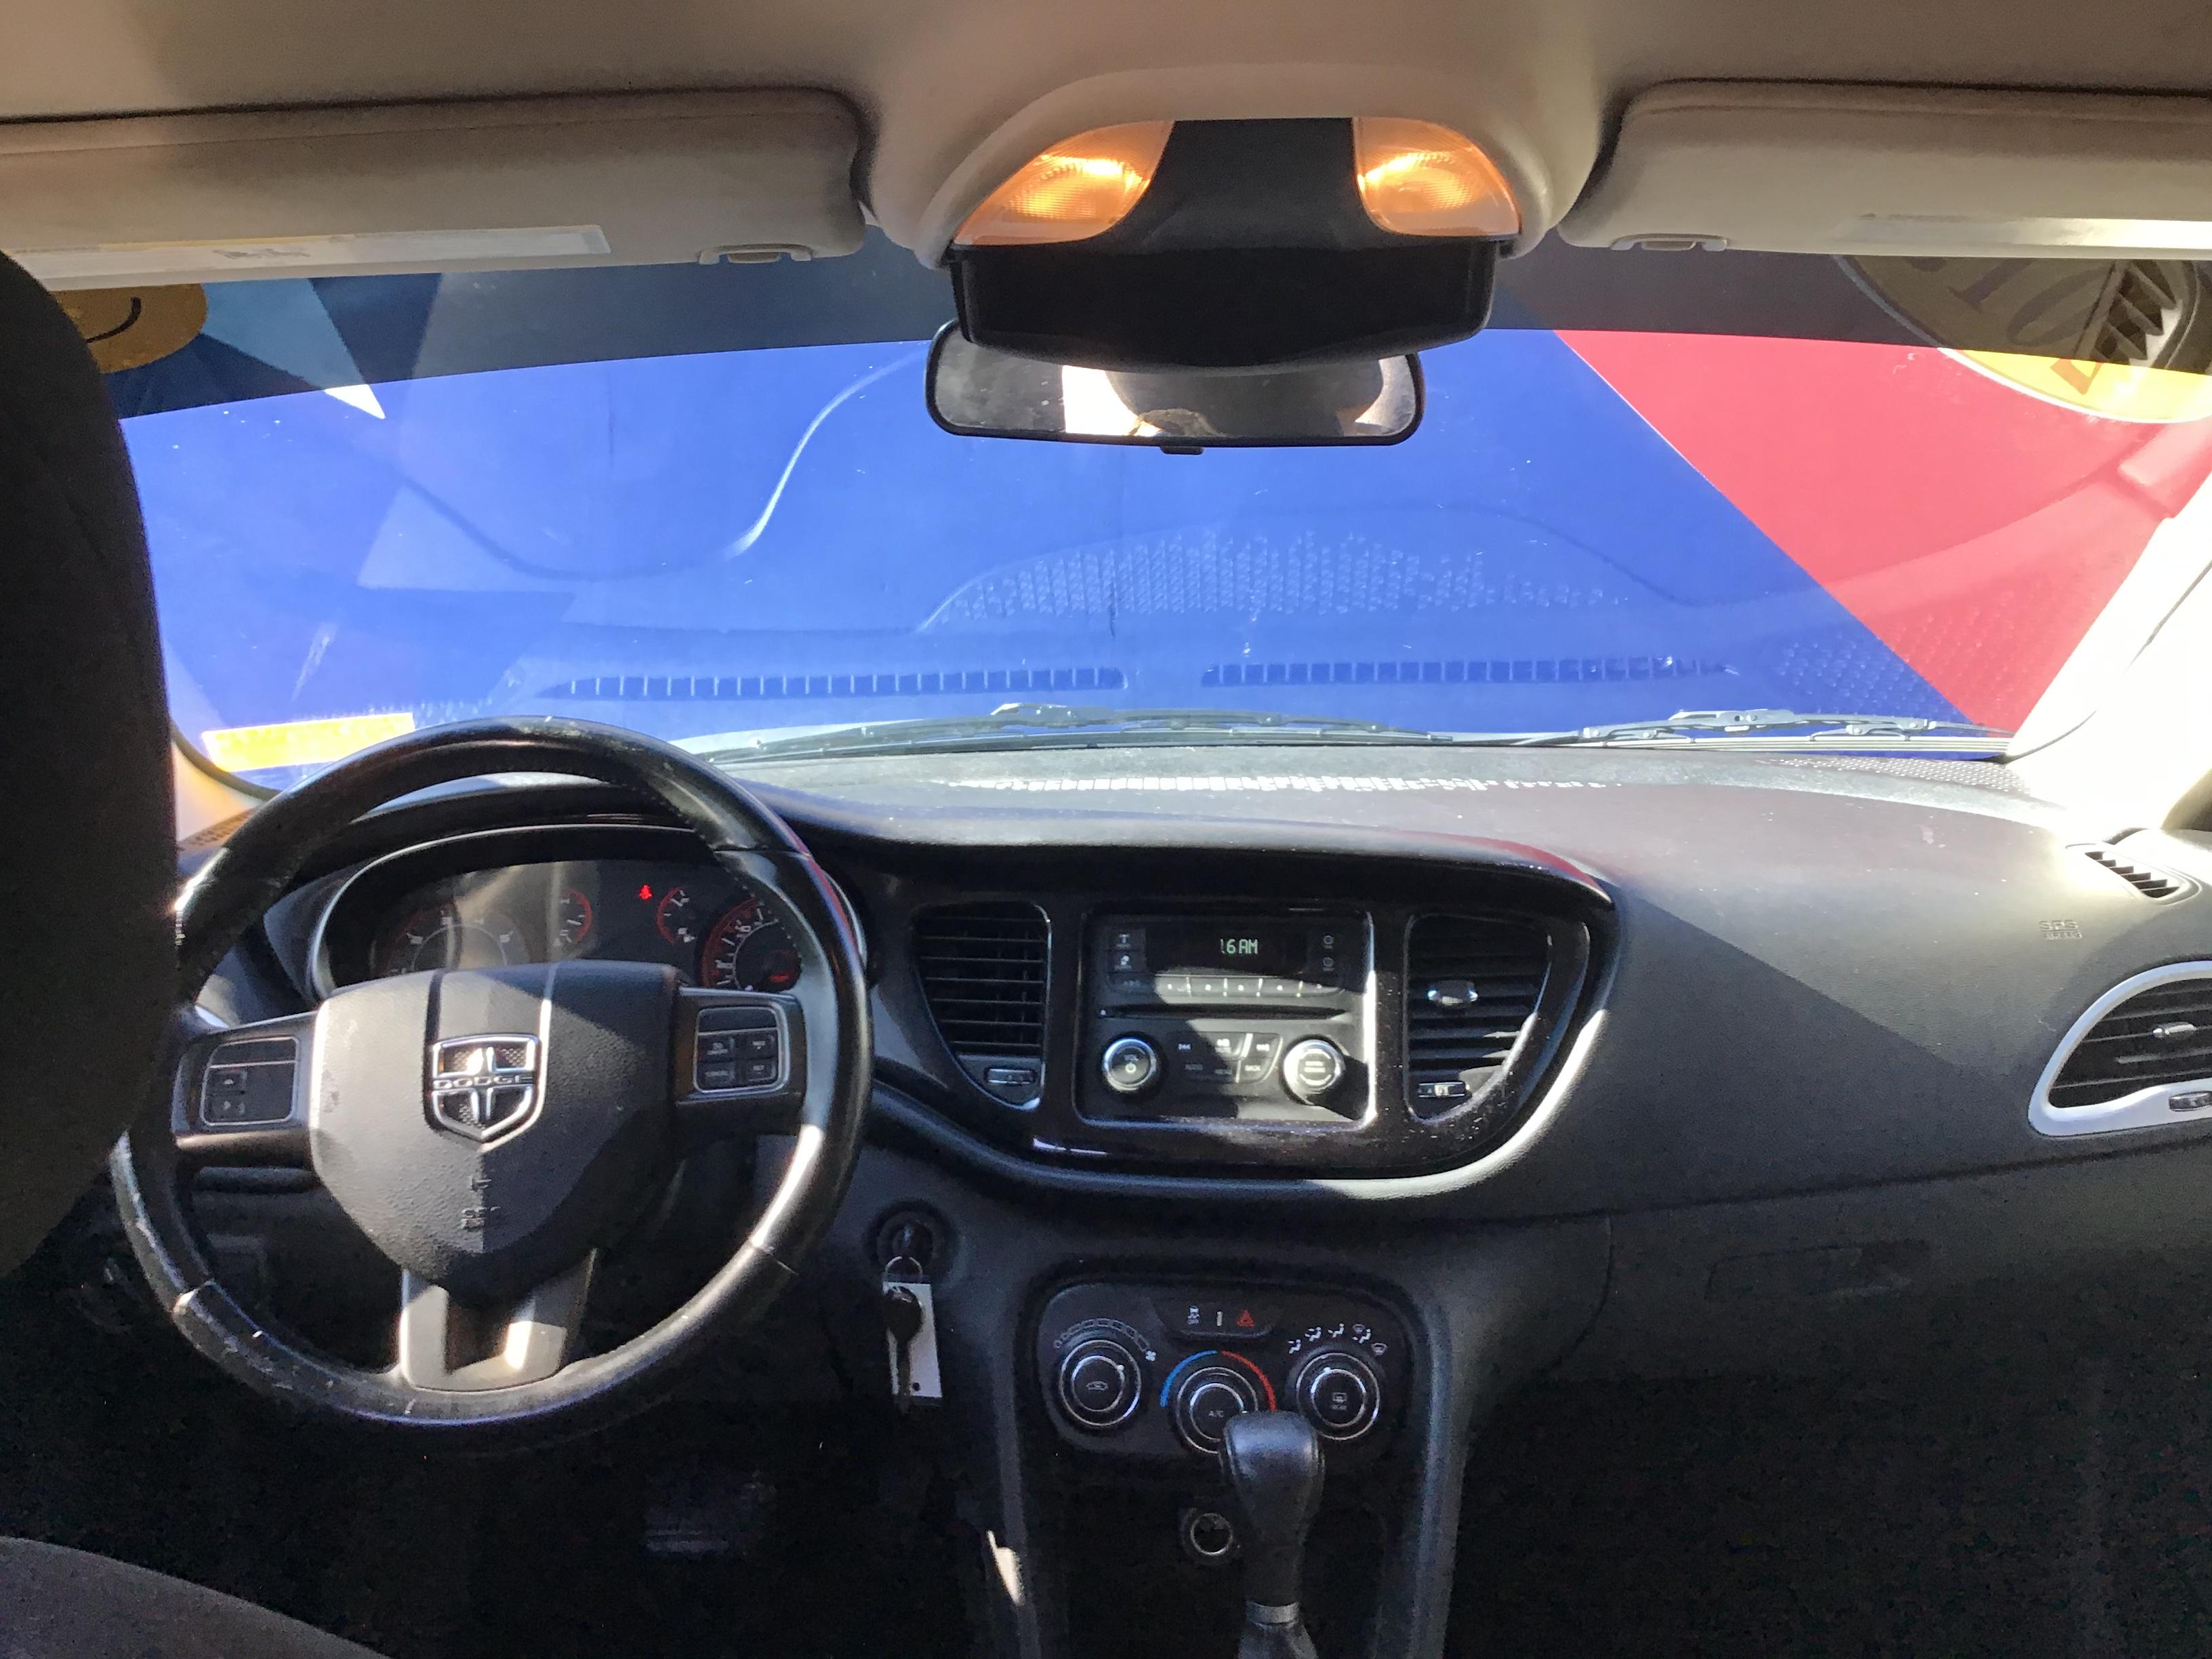 used vehicle - 4 DOOR SEDAN DODGE DART 2013